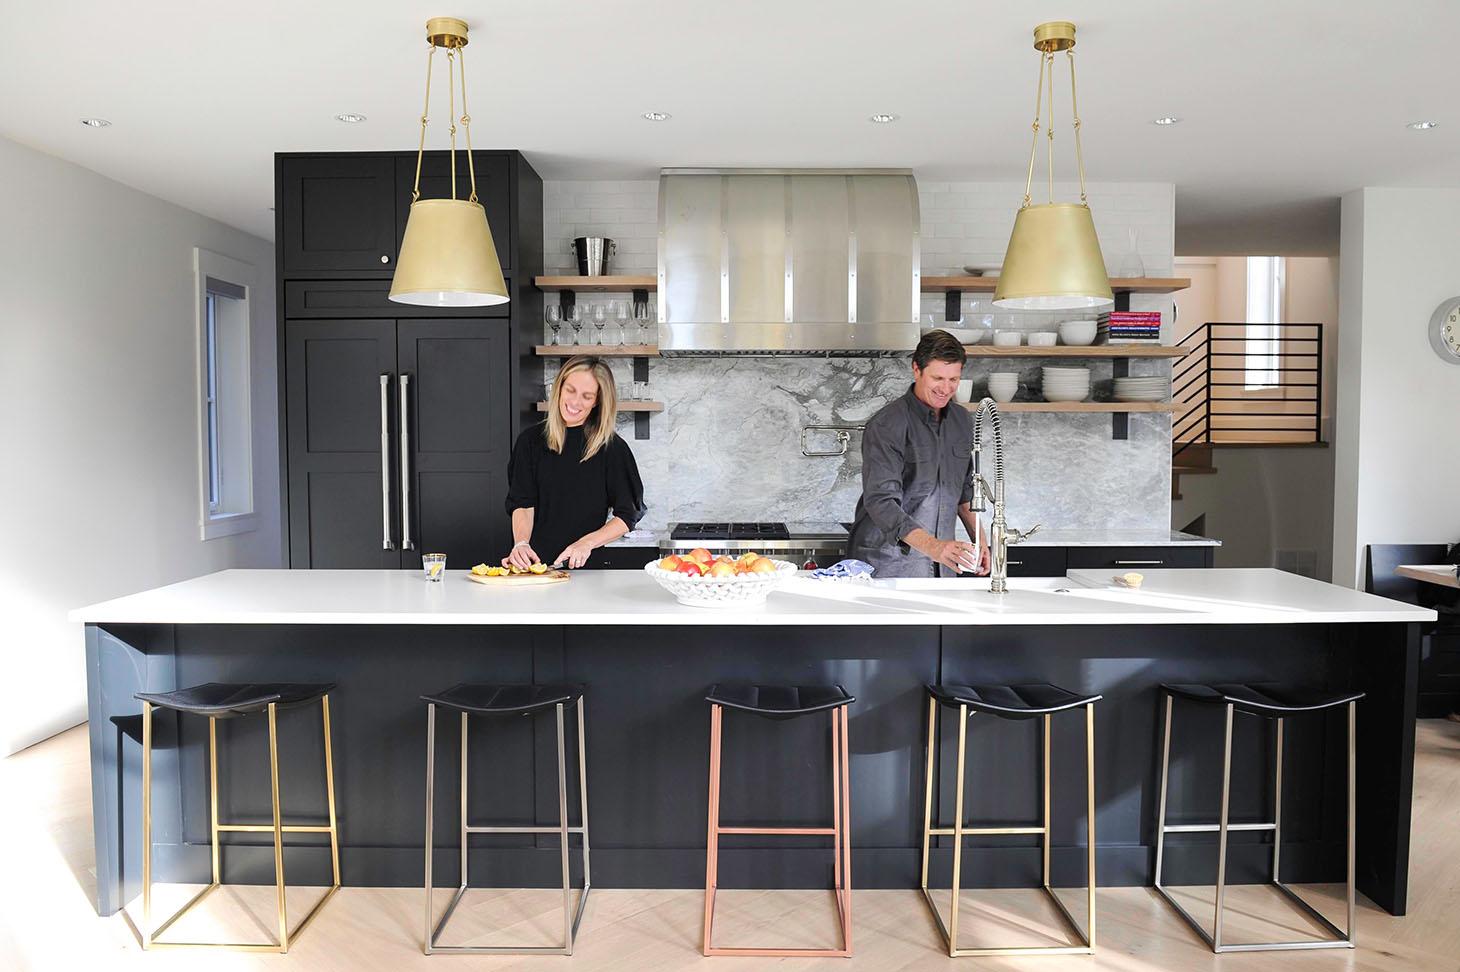 Jillian-Harris-Update-on-Kenny-and-Michelle-Gemmills-Home-Renovation-14.jpg